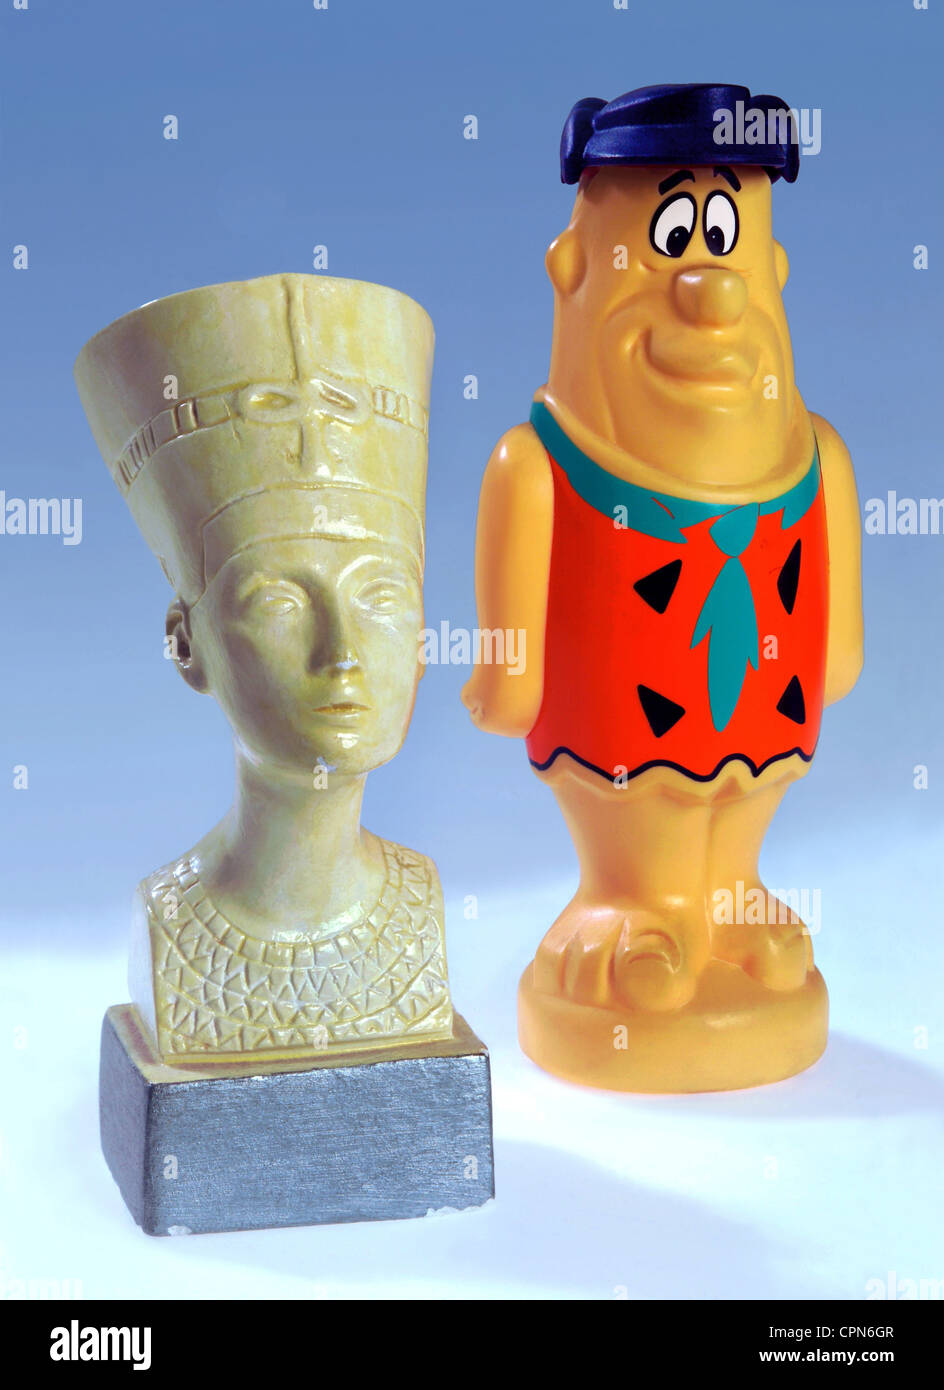 tourism, souvenirs, Nefertiti, Fred Flintstone, plaster bust, plastic figure, Germany, figure, figures, statuette, - Stock Image